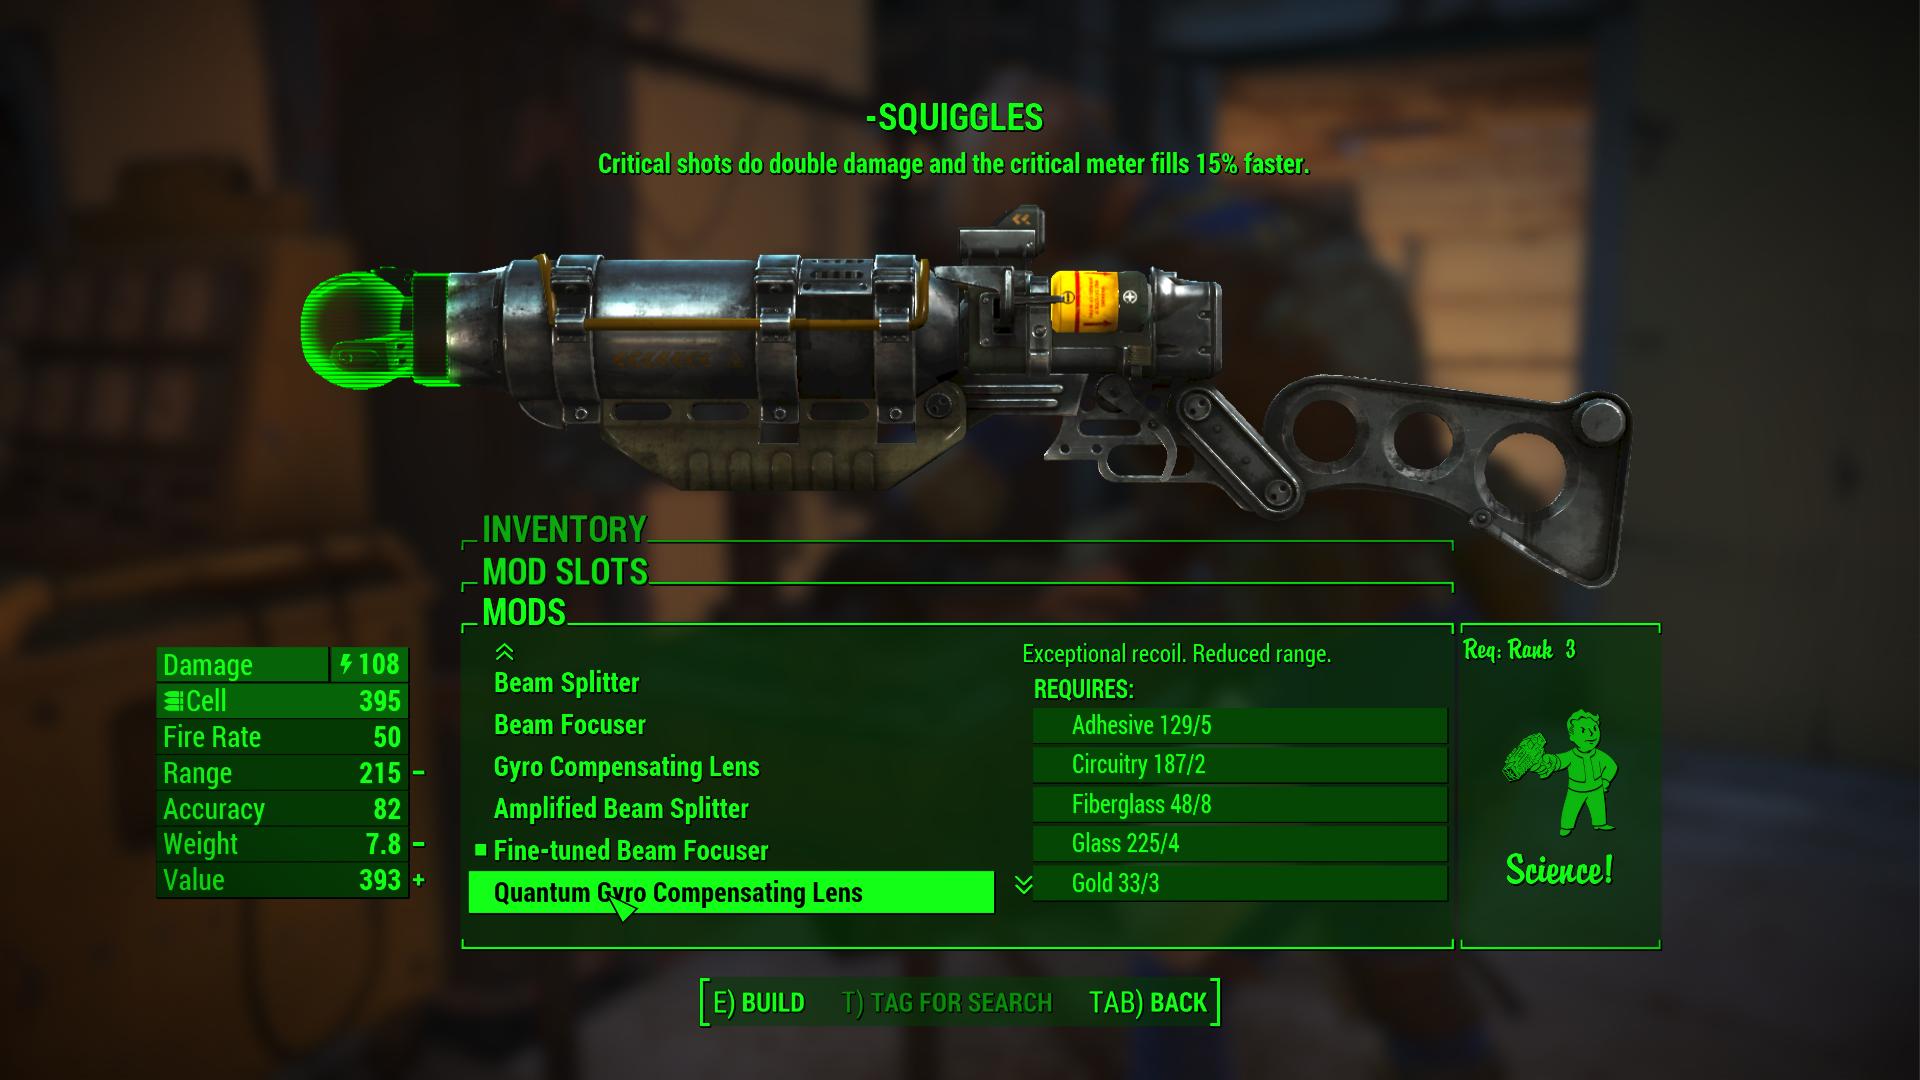 Time to modify Squiggles the laser devastator!